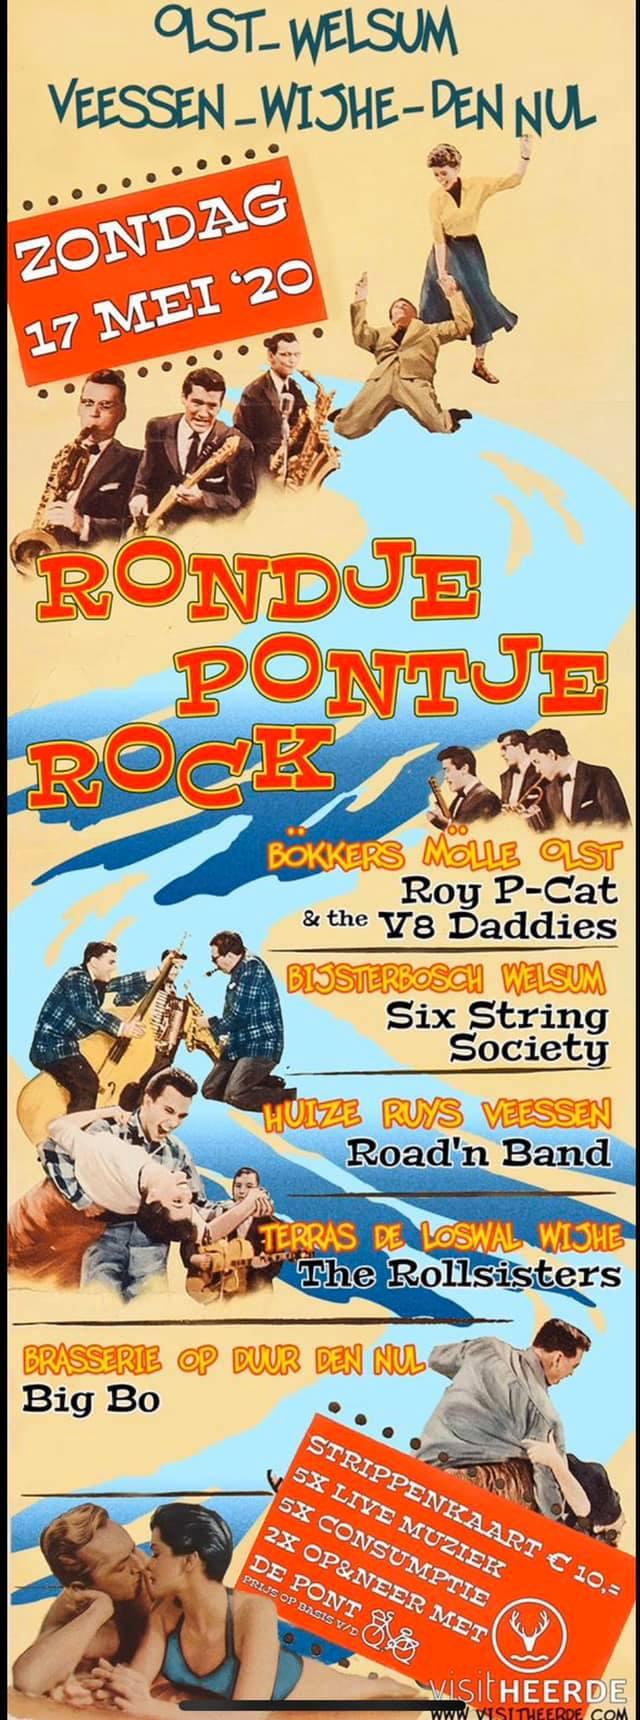 Rondje Pontje Rock Festival